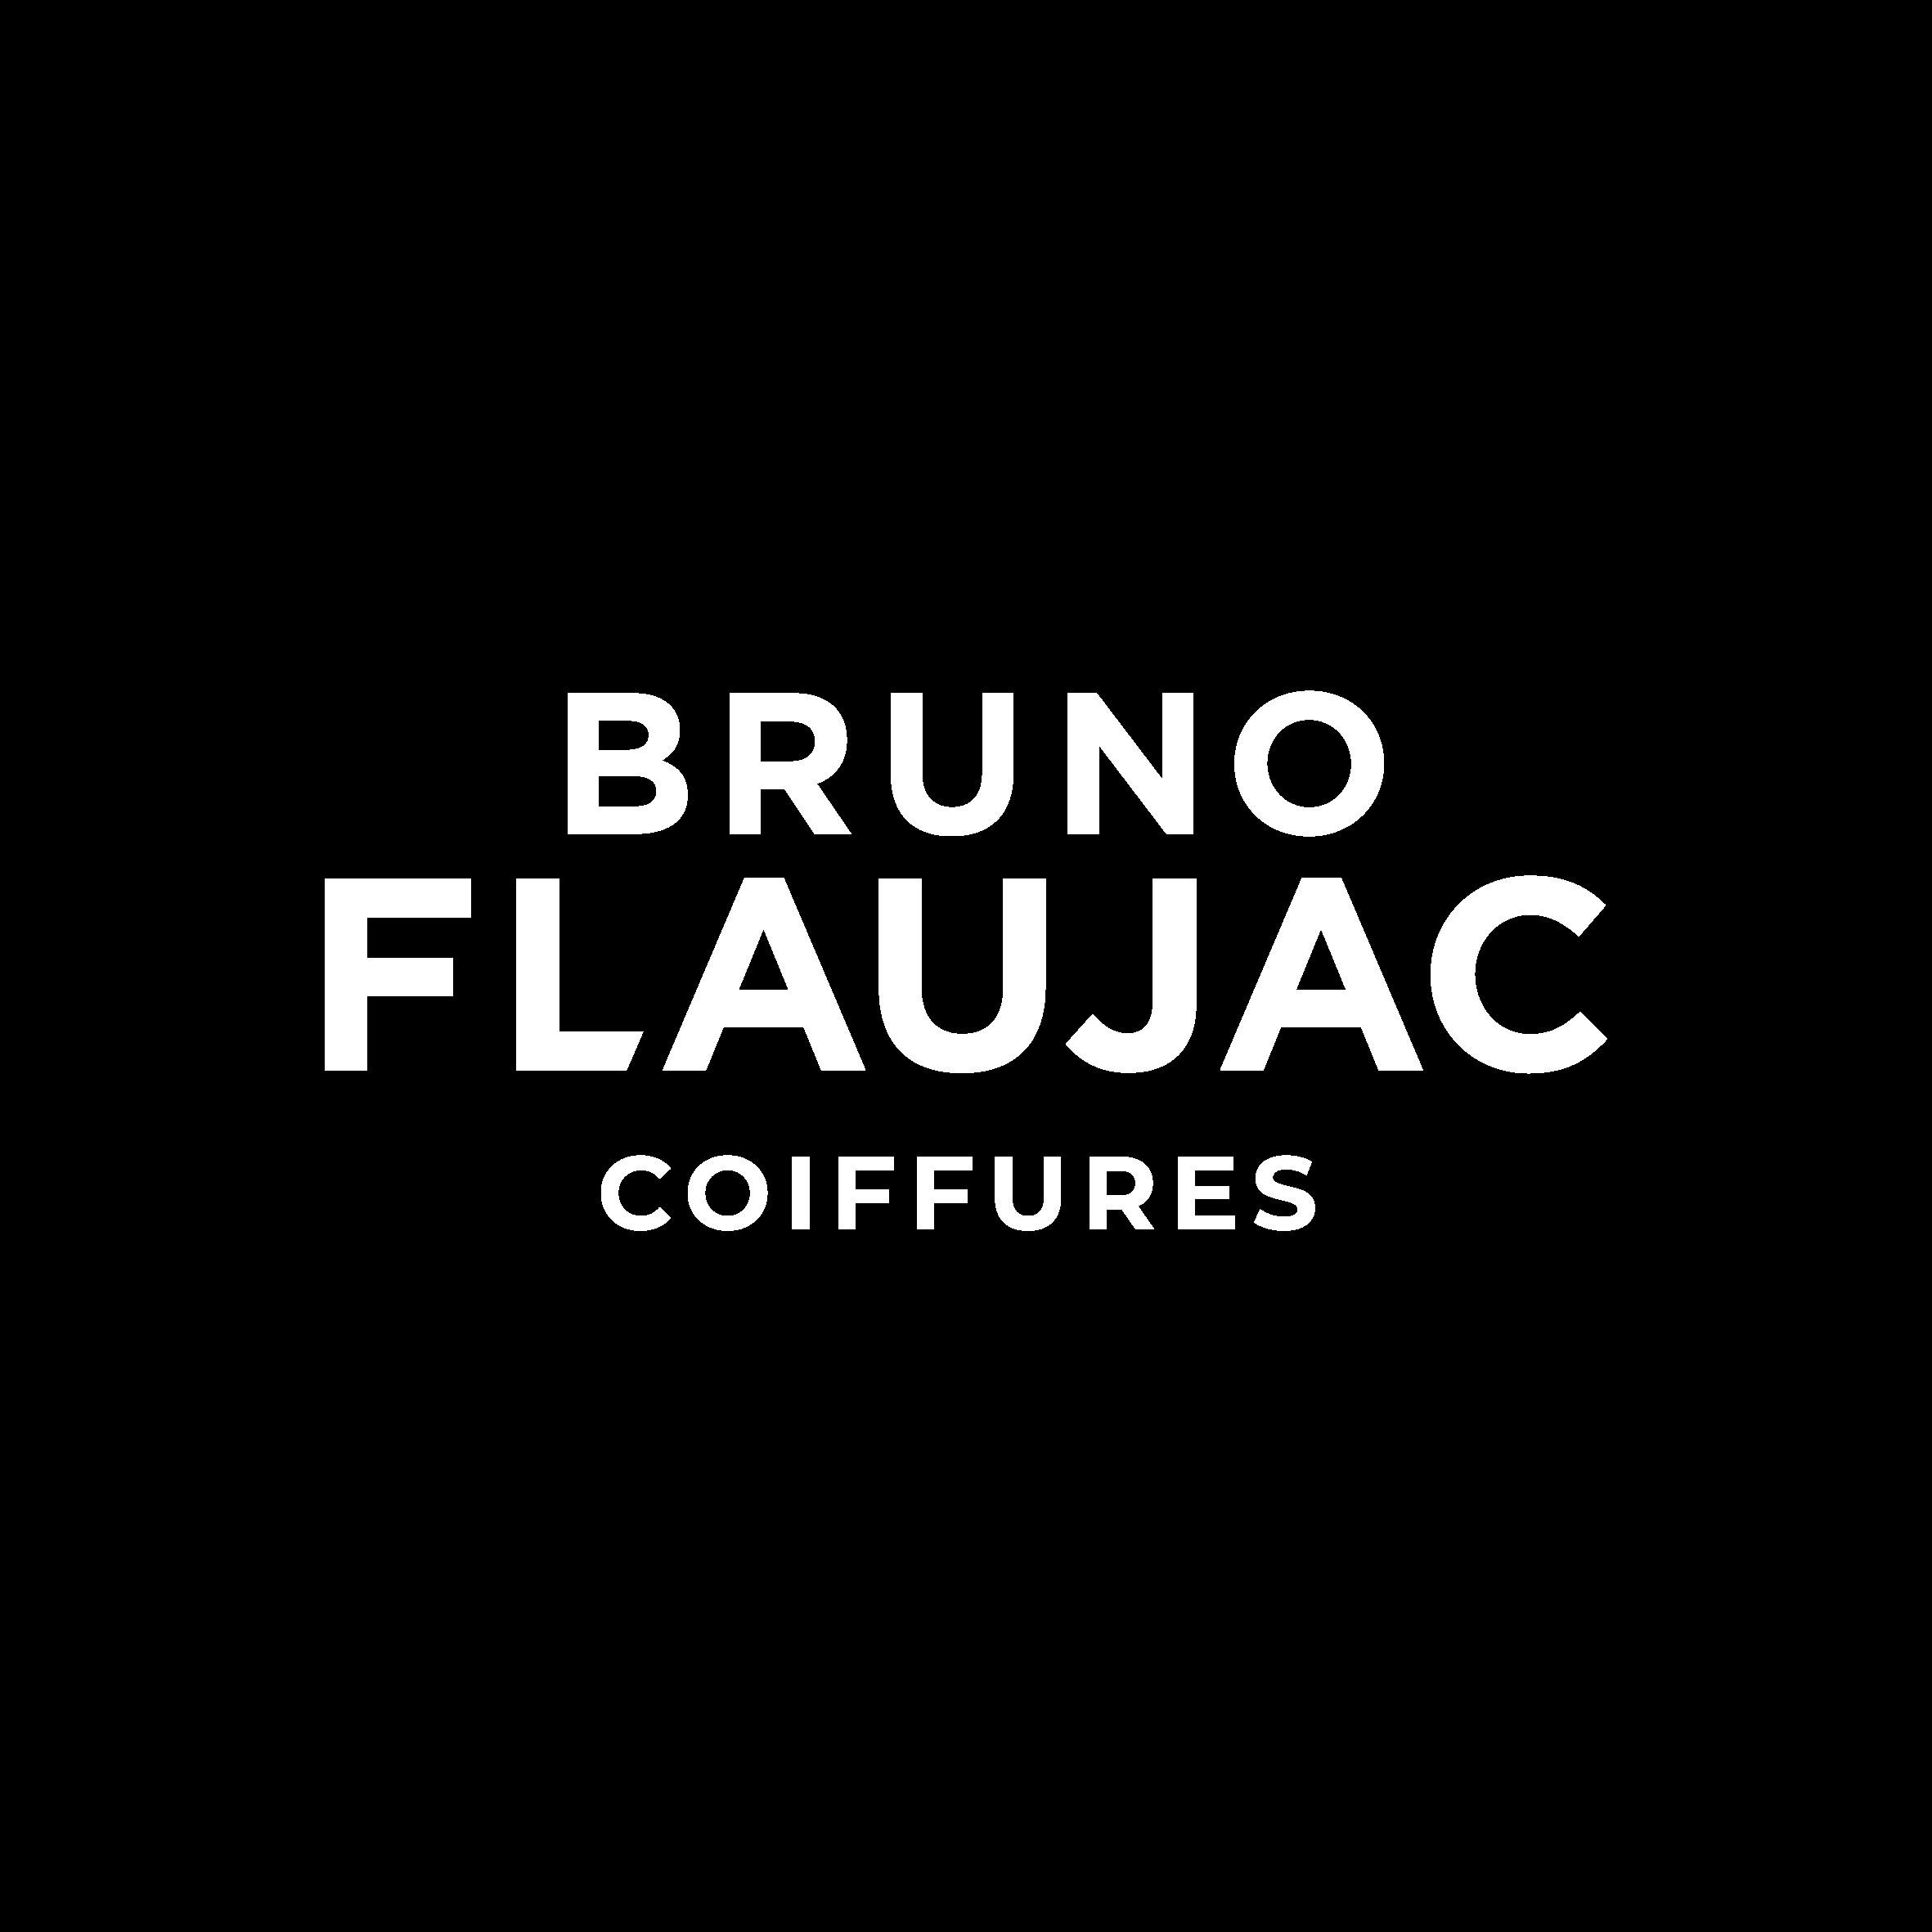 Logo BRUNO FLAUJAC NIMES COURBESSAC